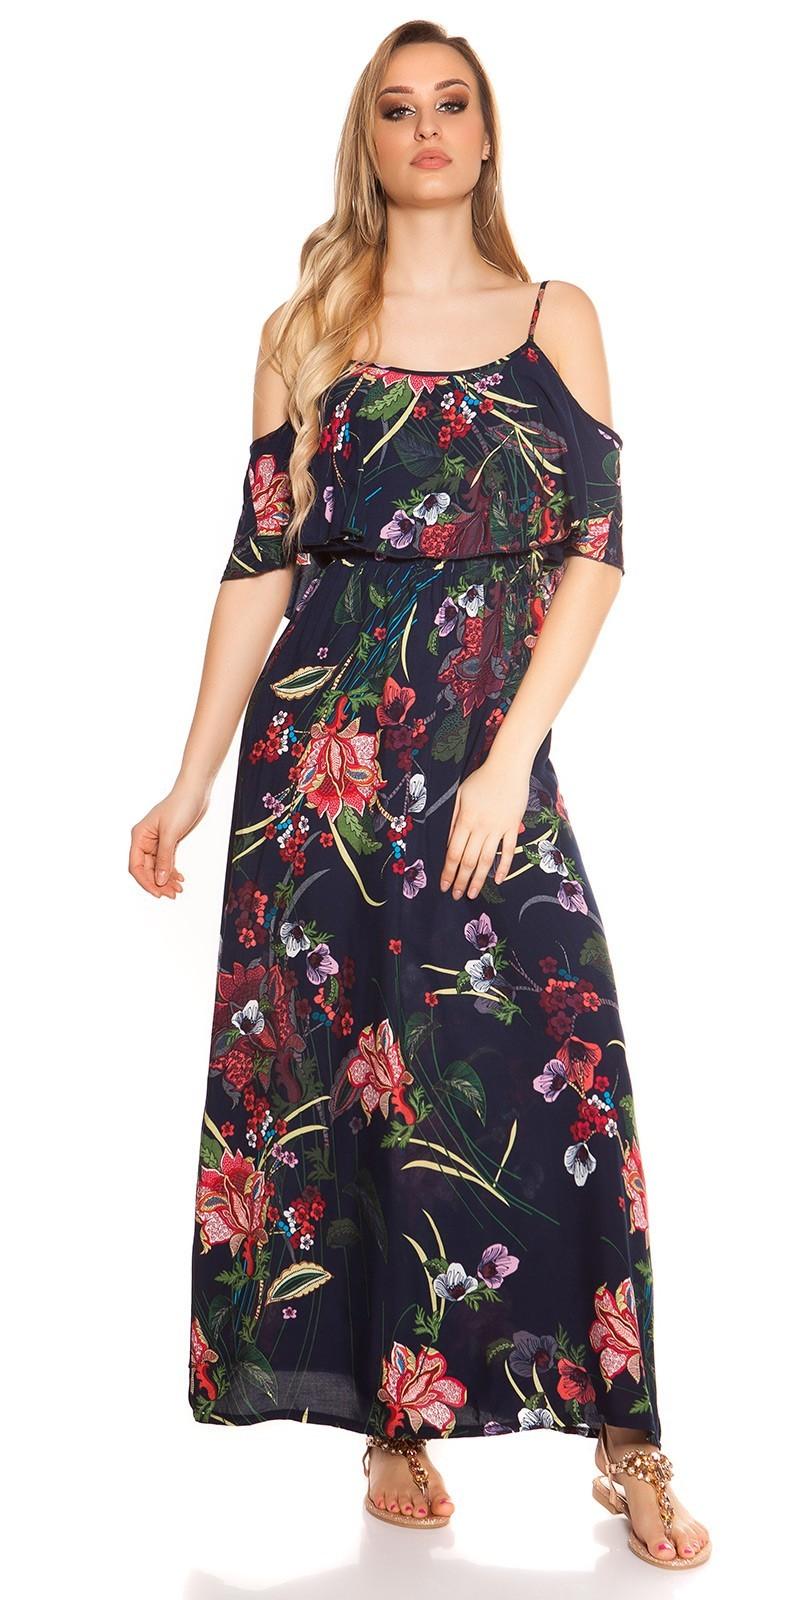 f8942a2ed537 Kvetované dlhé letné šaty Coachella-style Navy. 25.90 €. Výber  možnostíQuick View